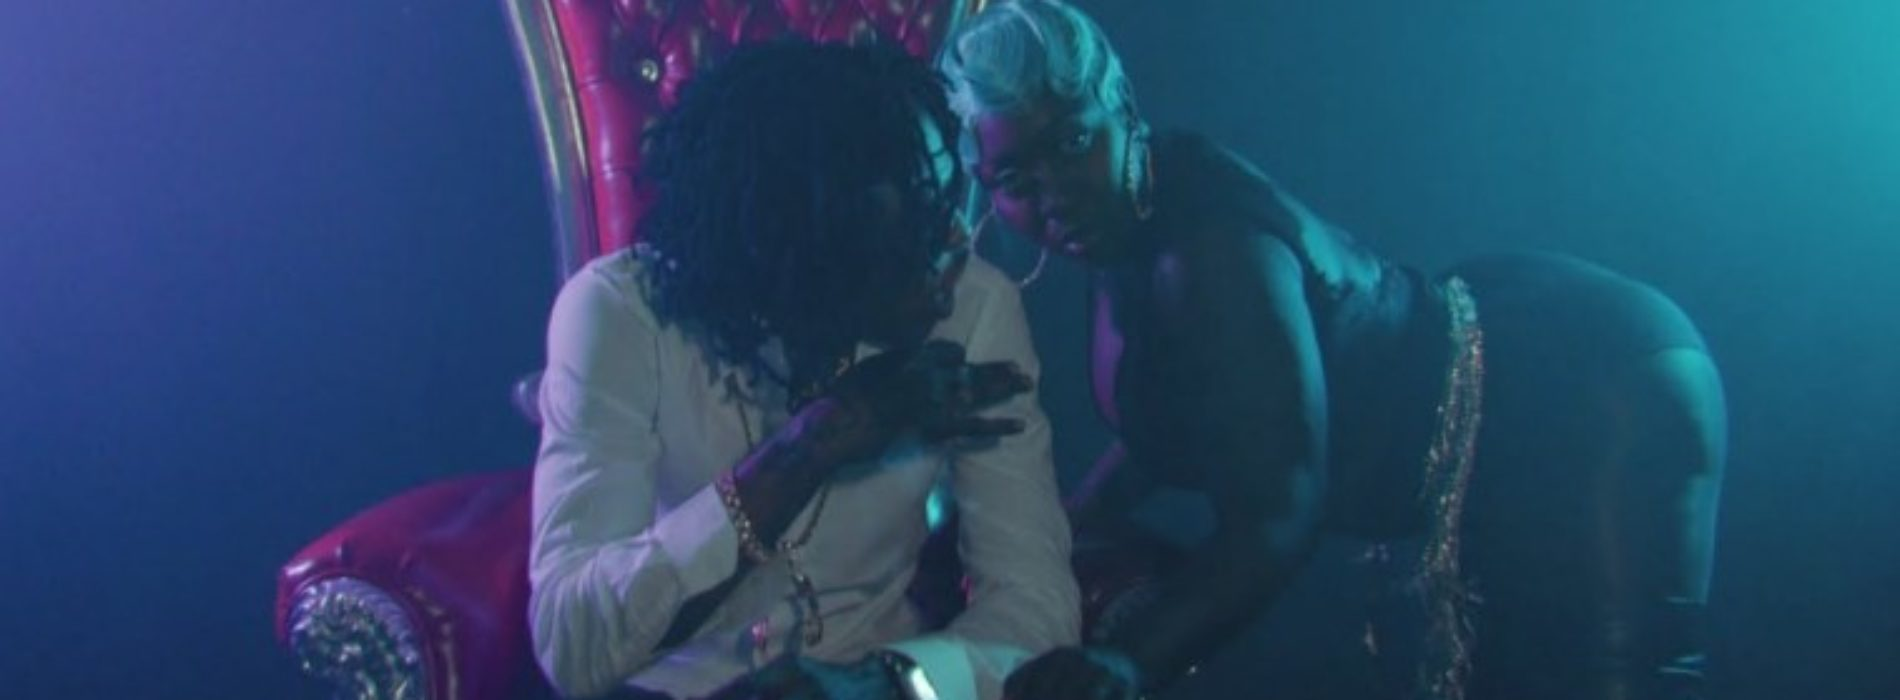 Vybz Kartel, Spice – Back Way (Official Video) – Juin 2019